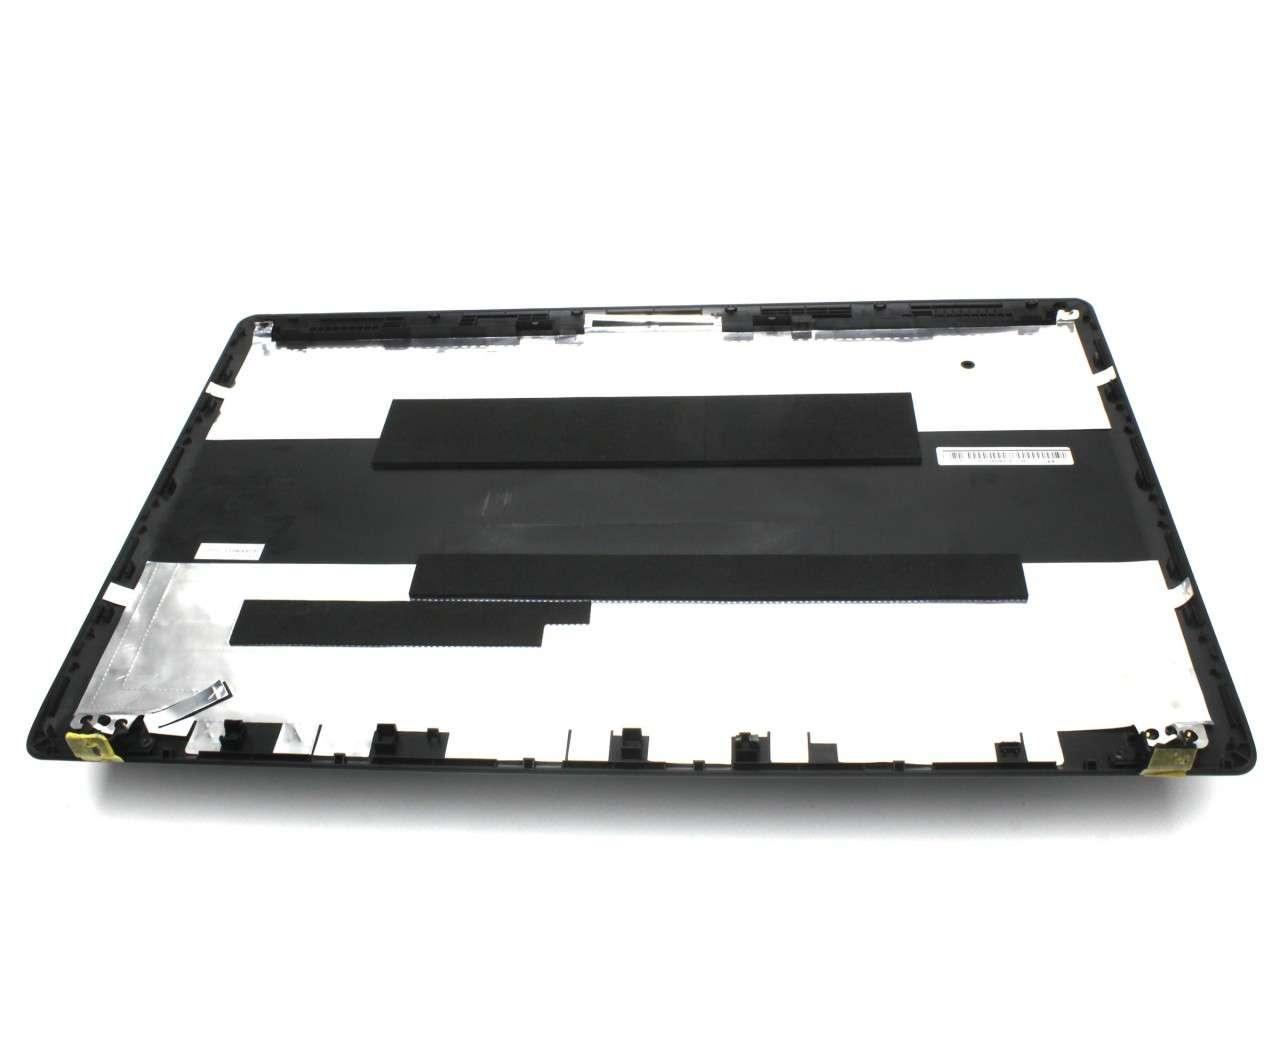 Capac Display BackCover IBM Lenovo G575M Carcasa Display Neagra imagine powerlaptop.ro 2021